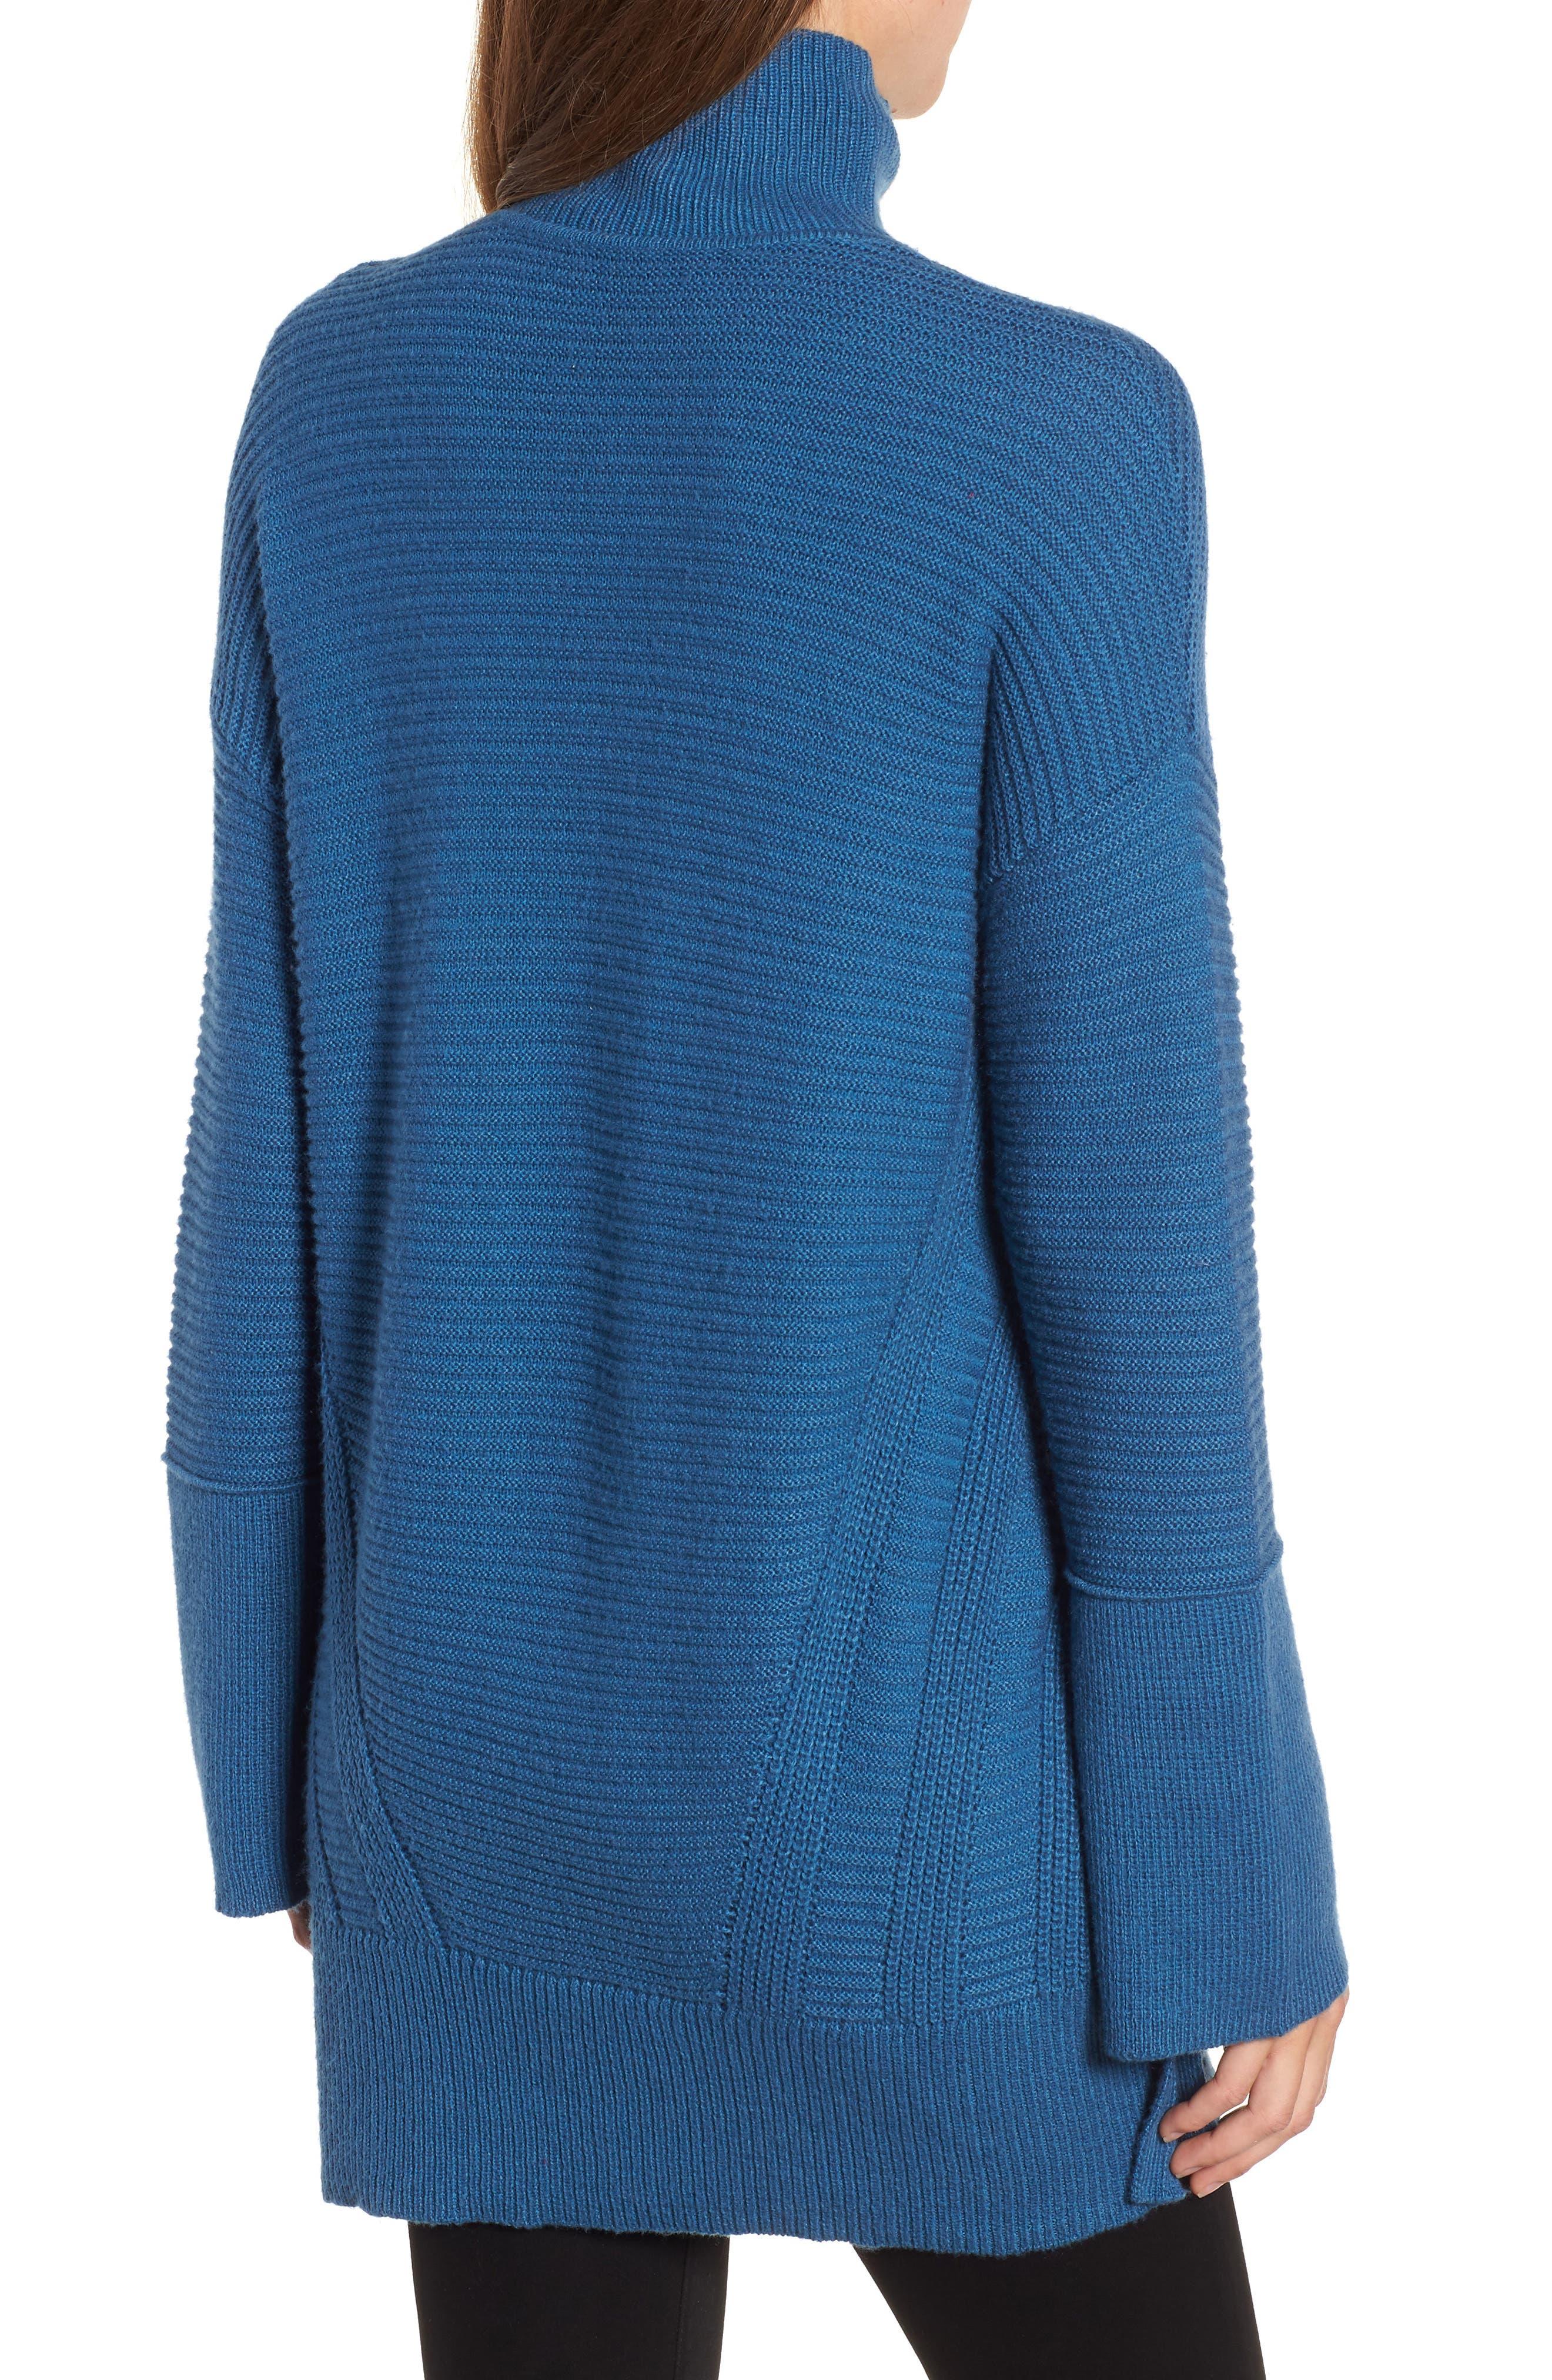 Ribbed Turtleneck Tunic Sweater,                             Alternate thumbnail 2, color,                             BLUE DARK